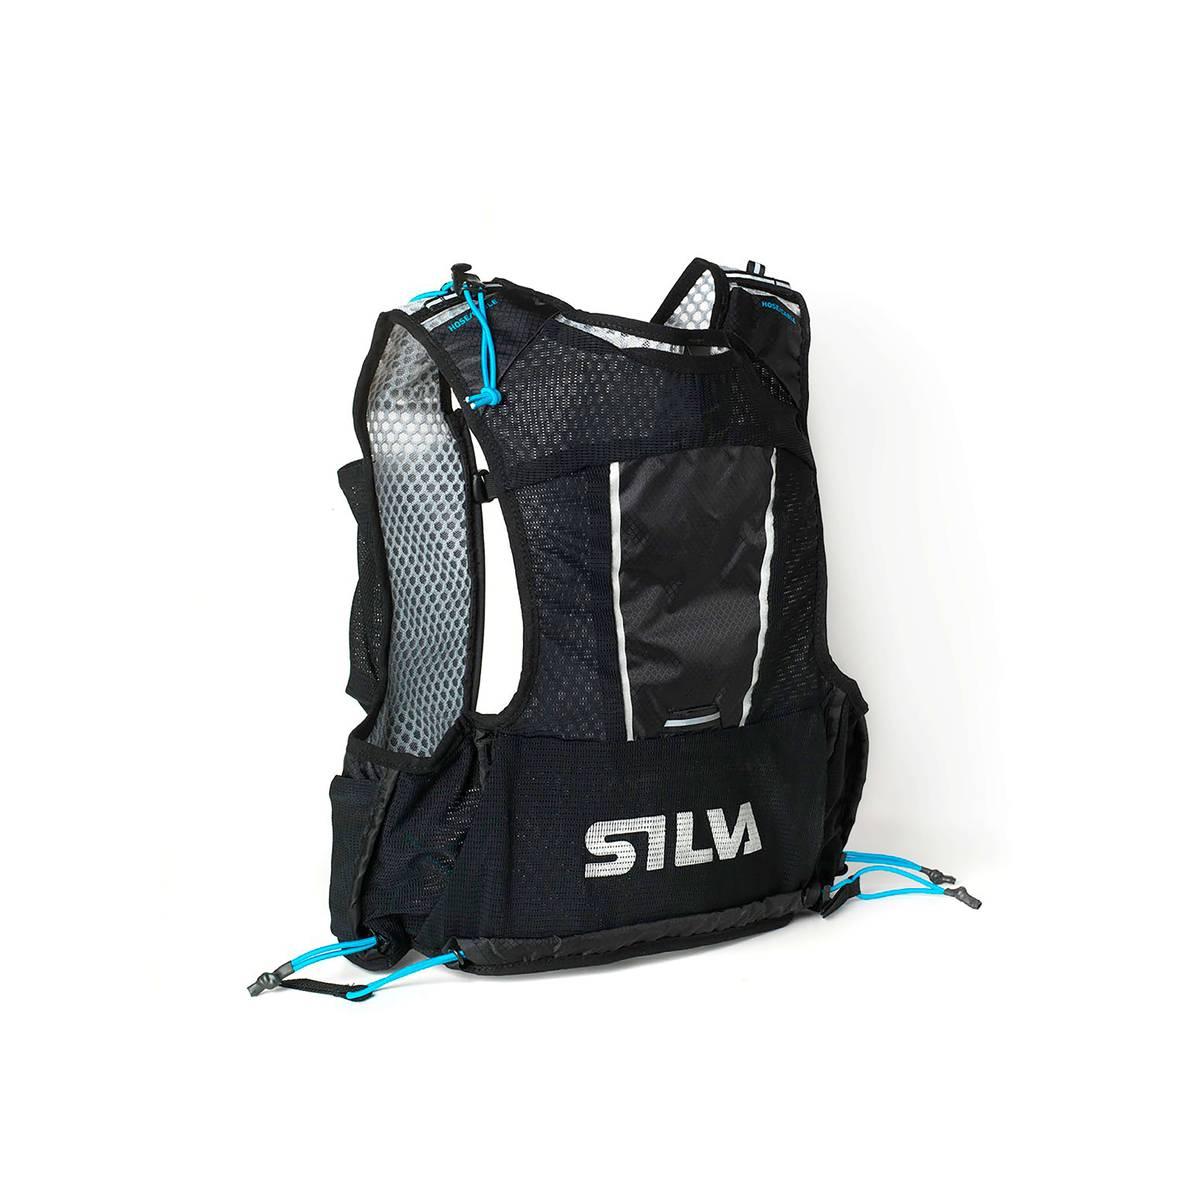 Silva Strive Light Black 5